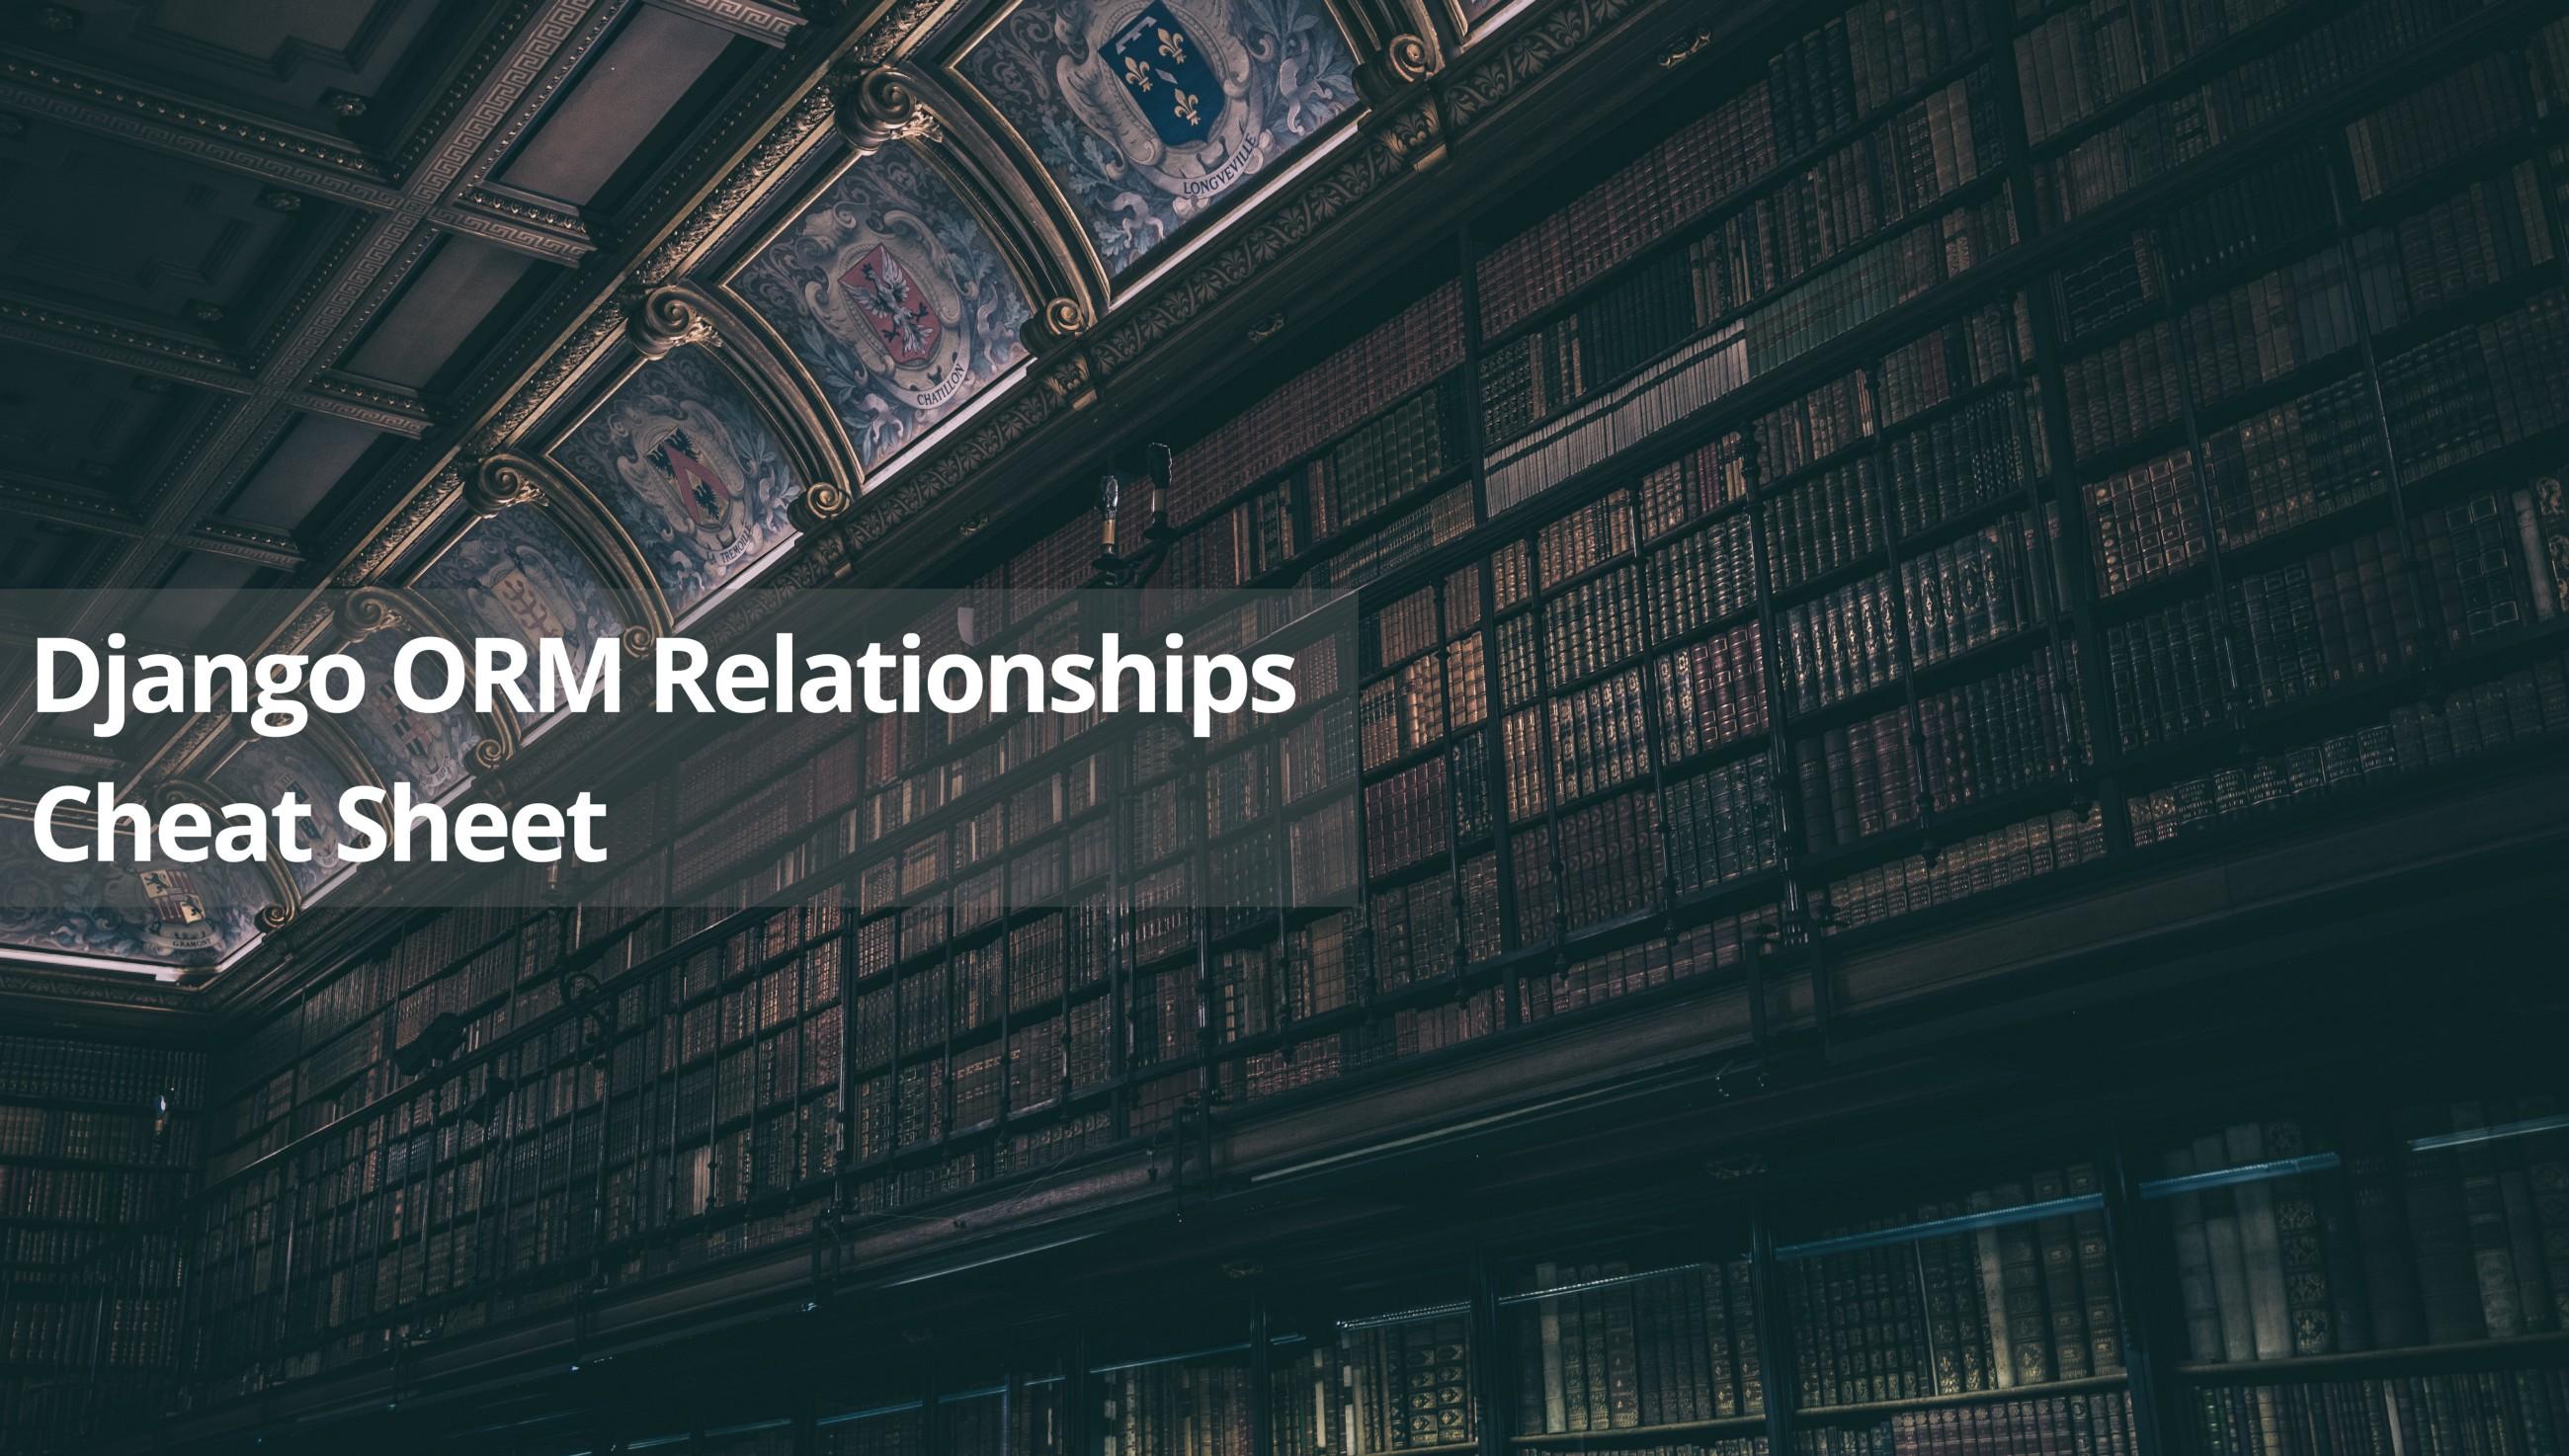 /django-orm-relationships-cheat-sheet-14433d6cf68c feature image